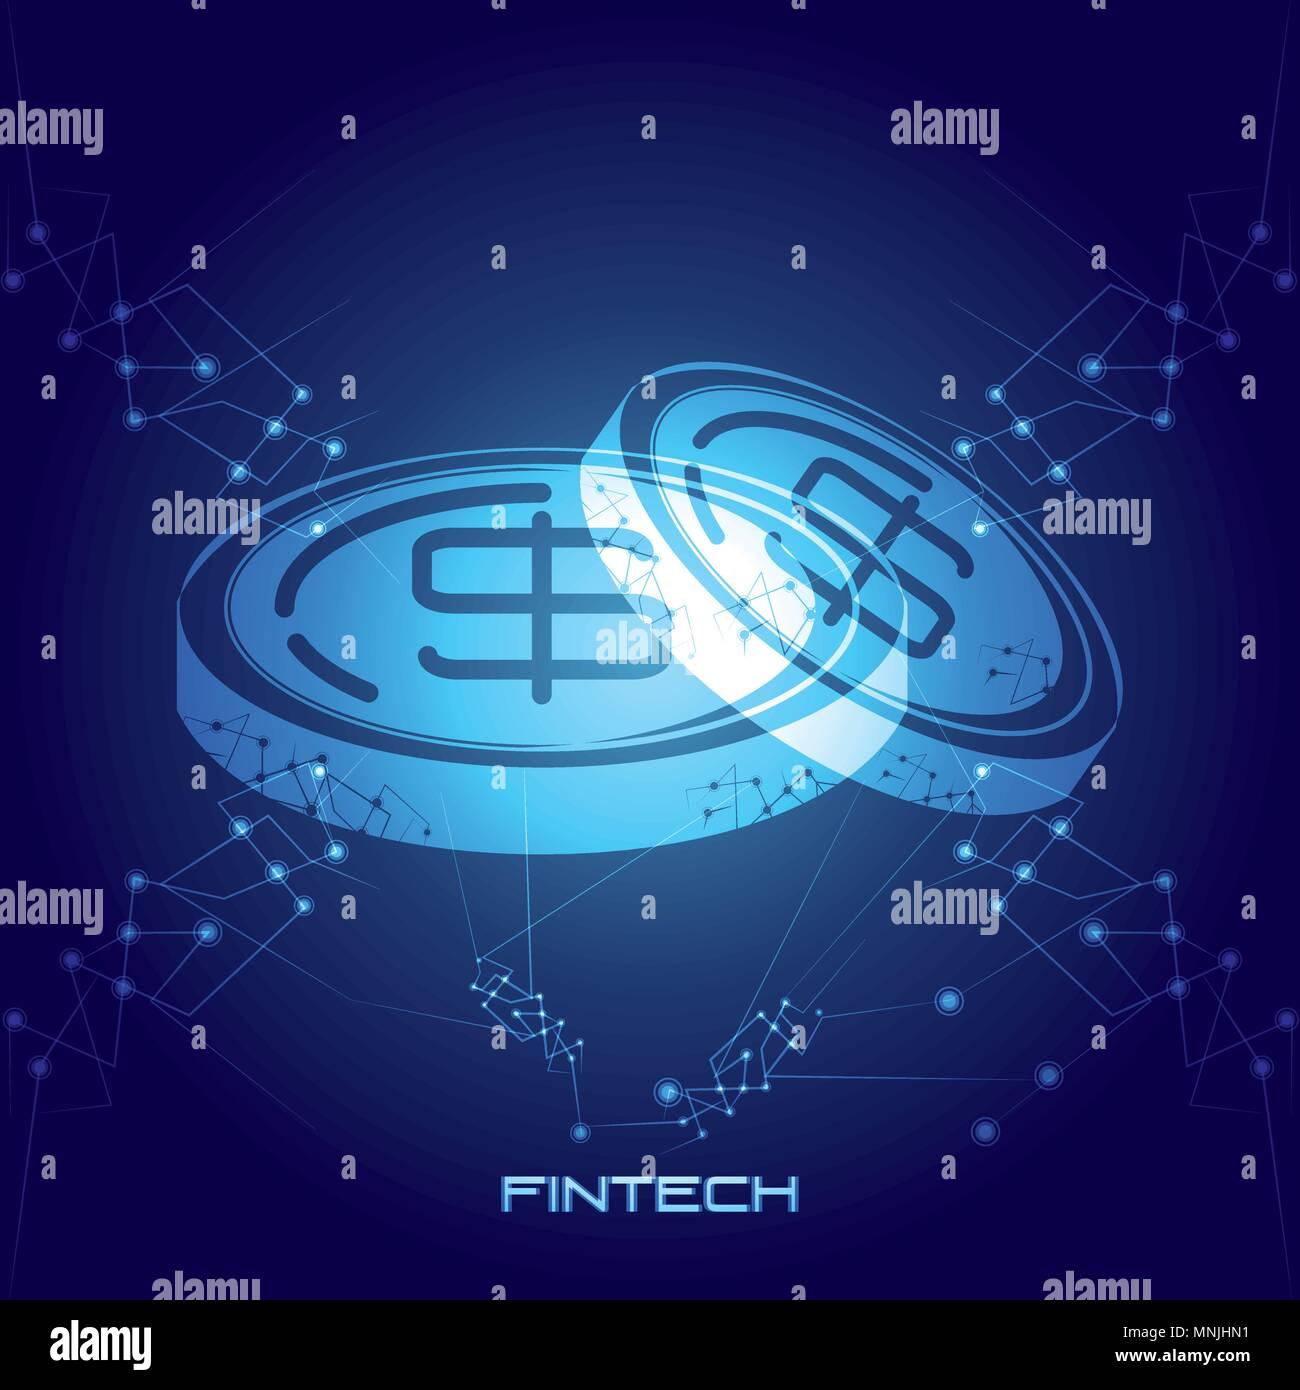 Monete denaro tecnologia finanziaria illustrazione vettoriale design Illustrazione Vettoriale